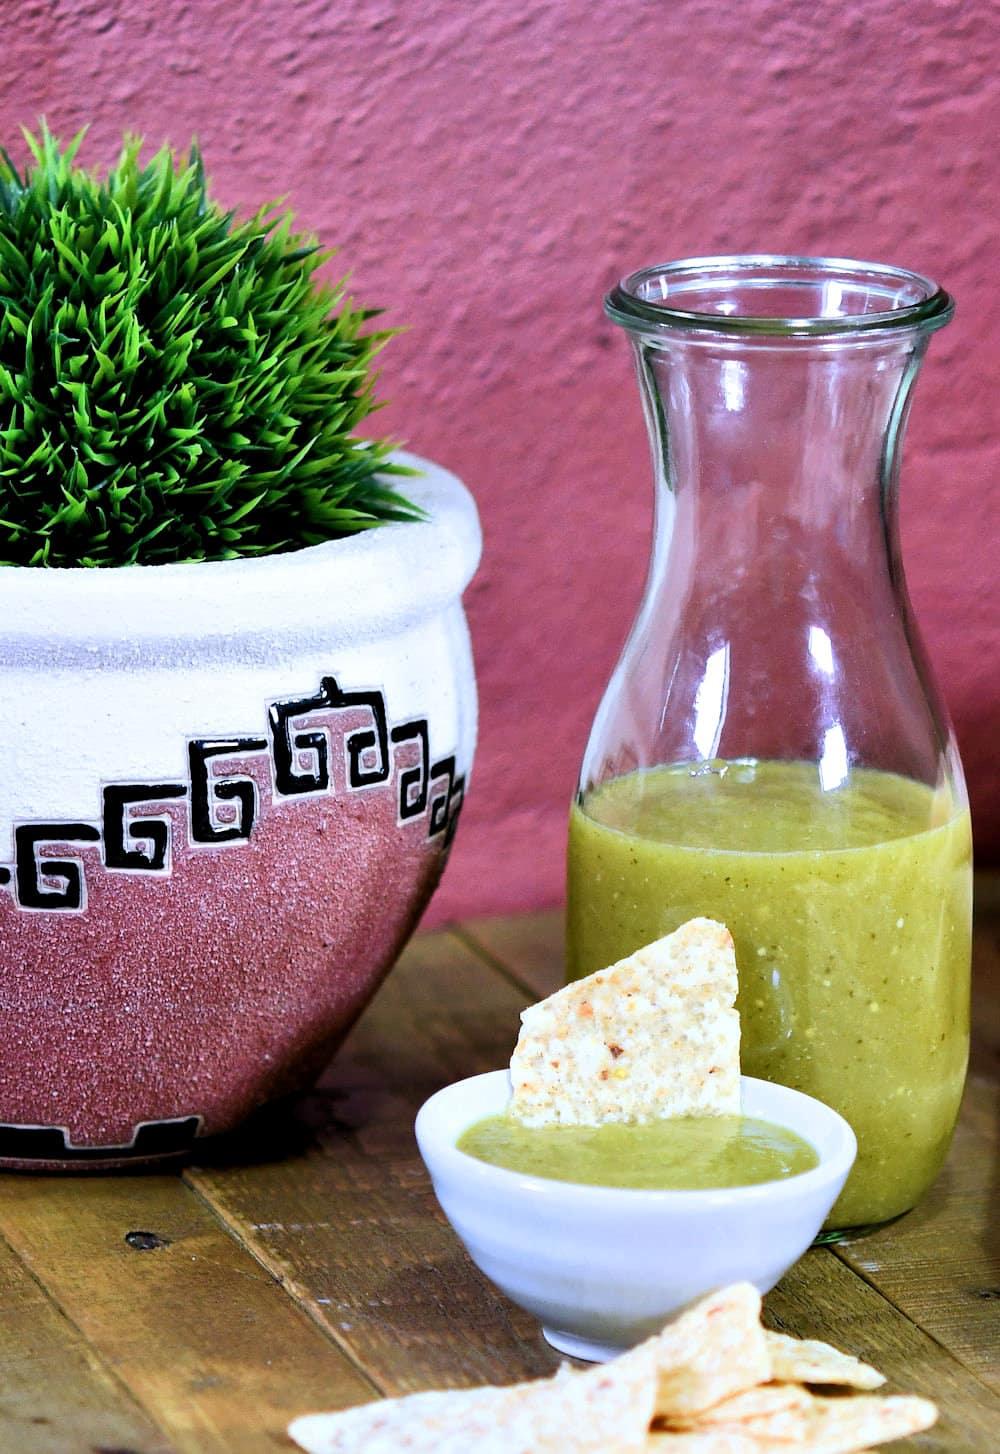 24bite: Salsa Verde Mexican Restaurant Style Recipe by Christian Guzman